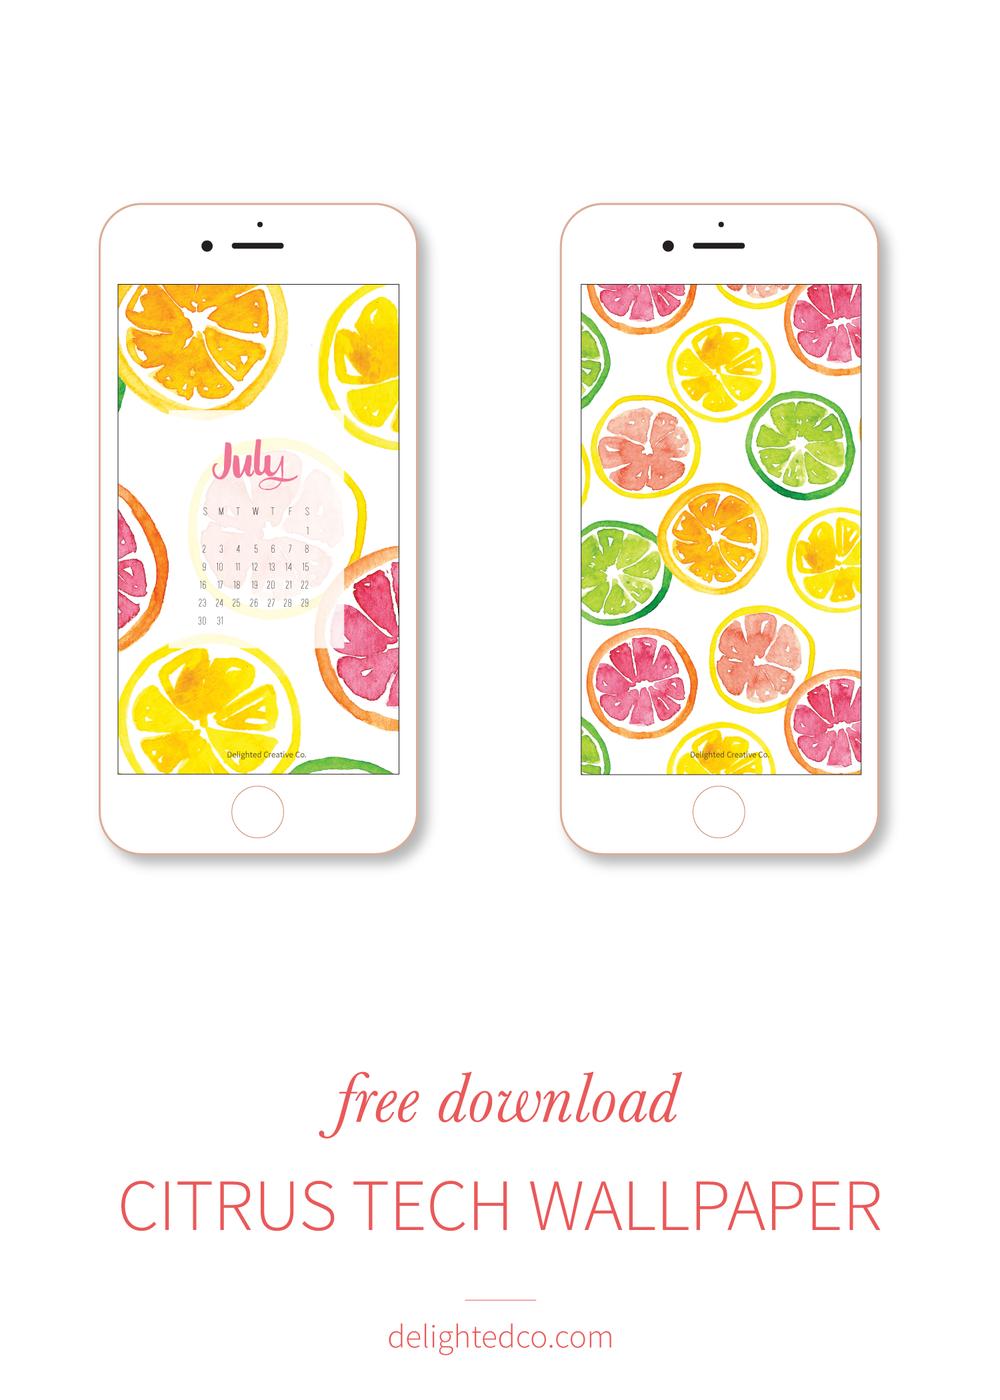 Happy tech wallpaper: free download at delightedco.com